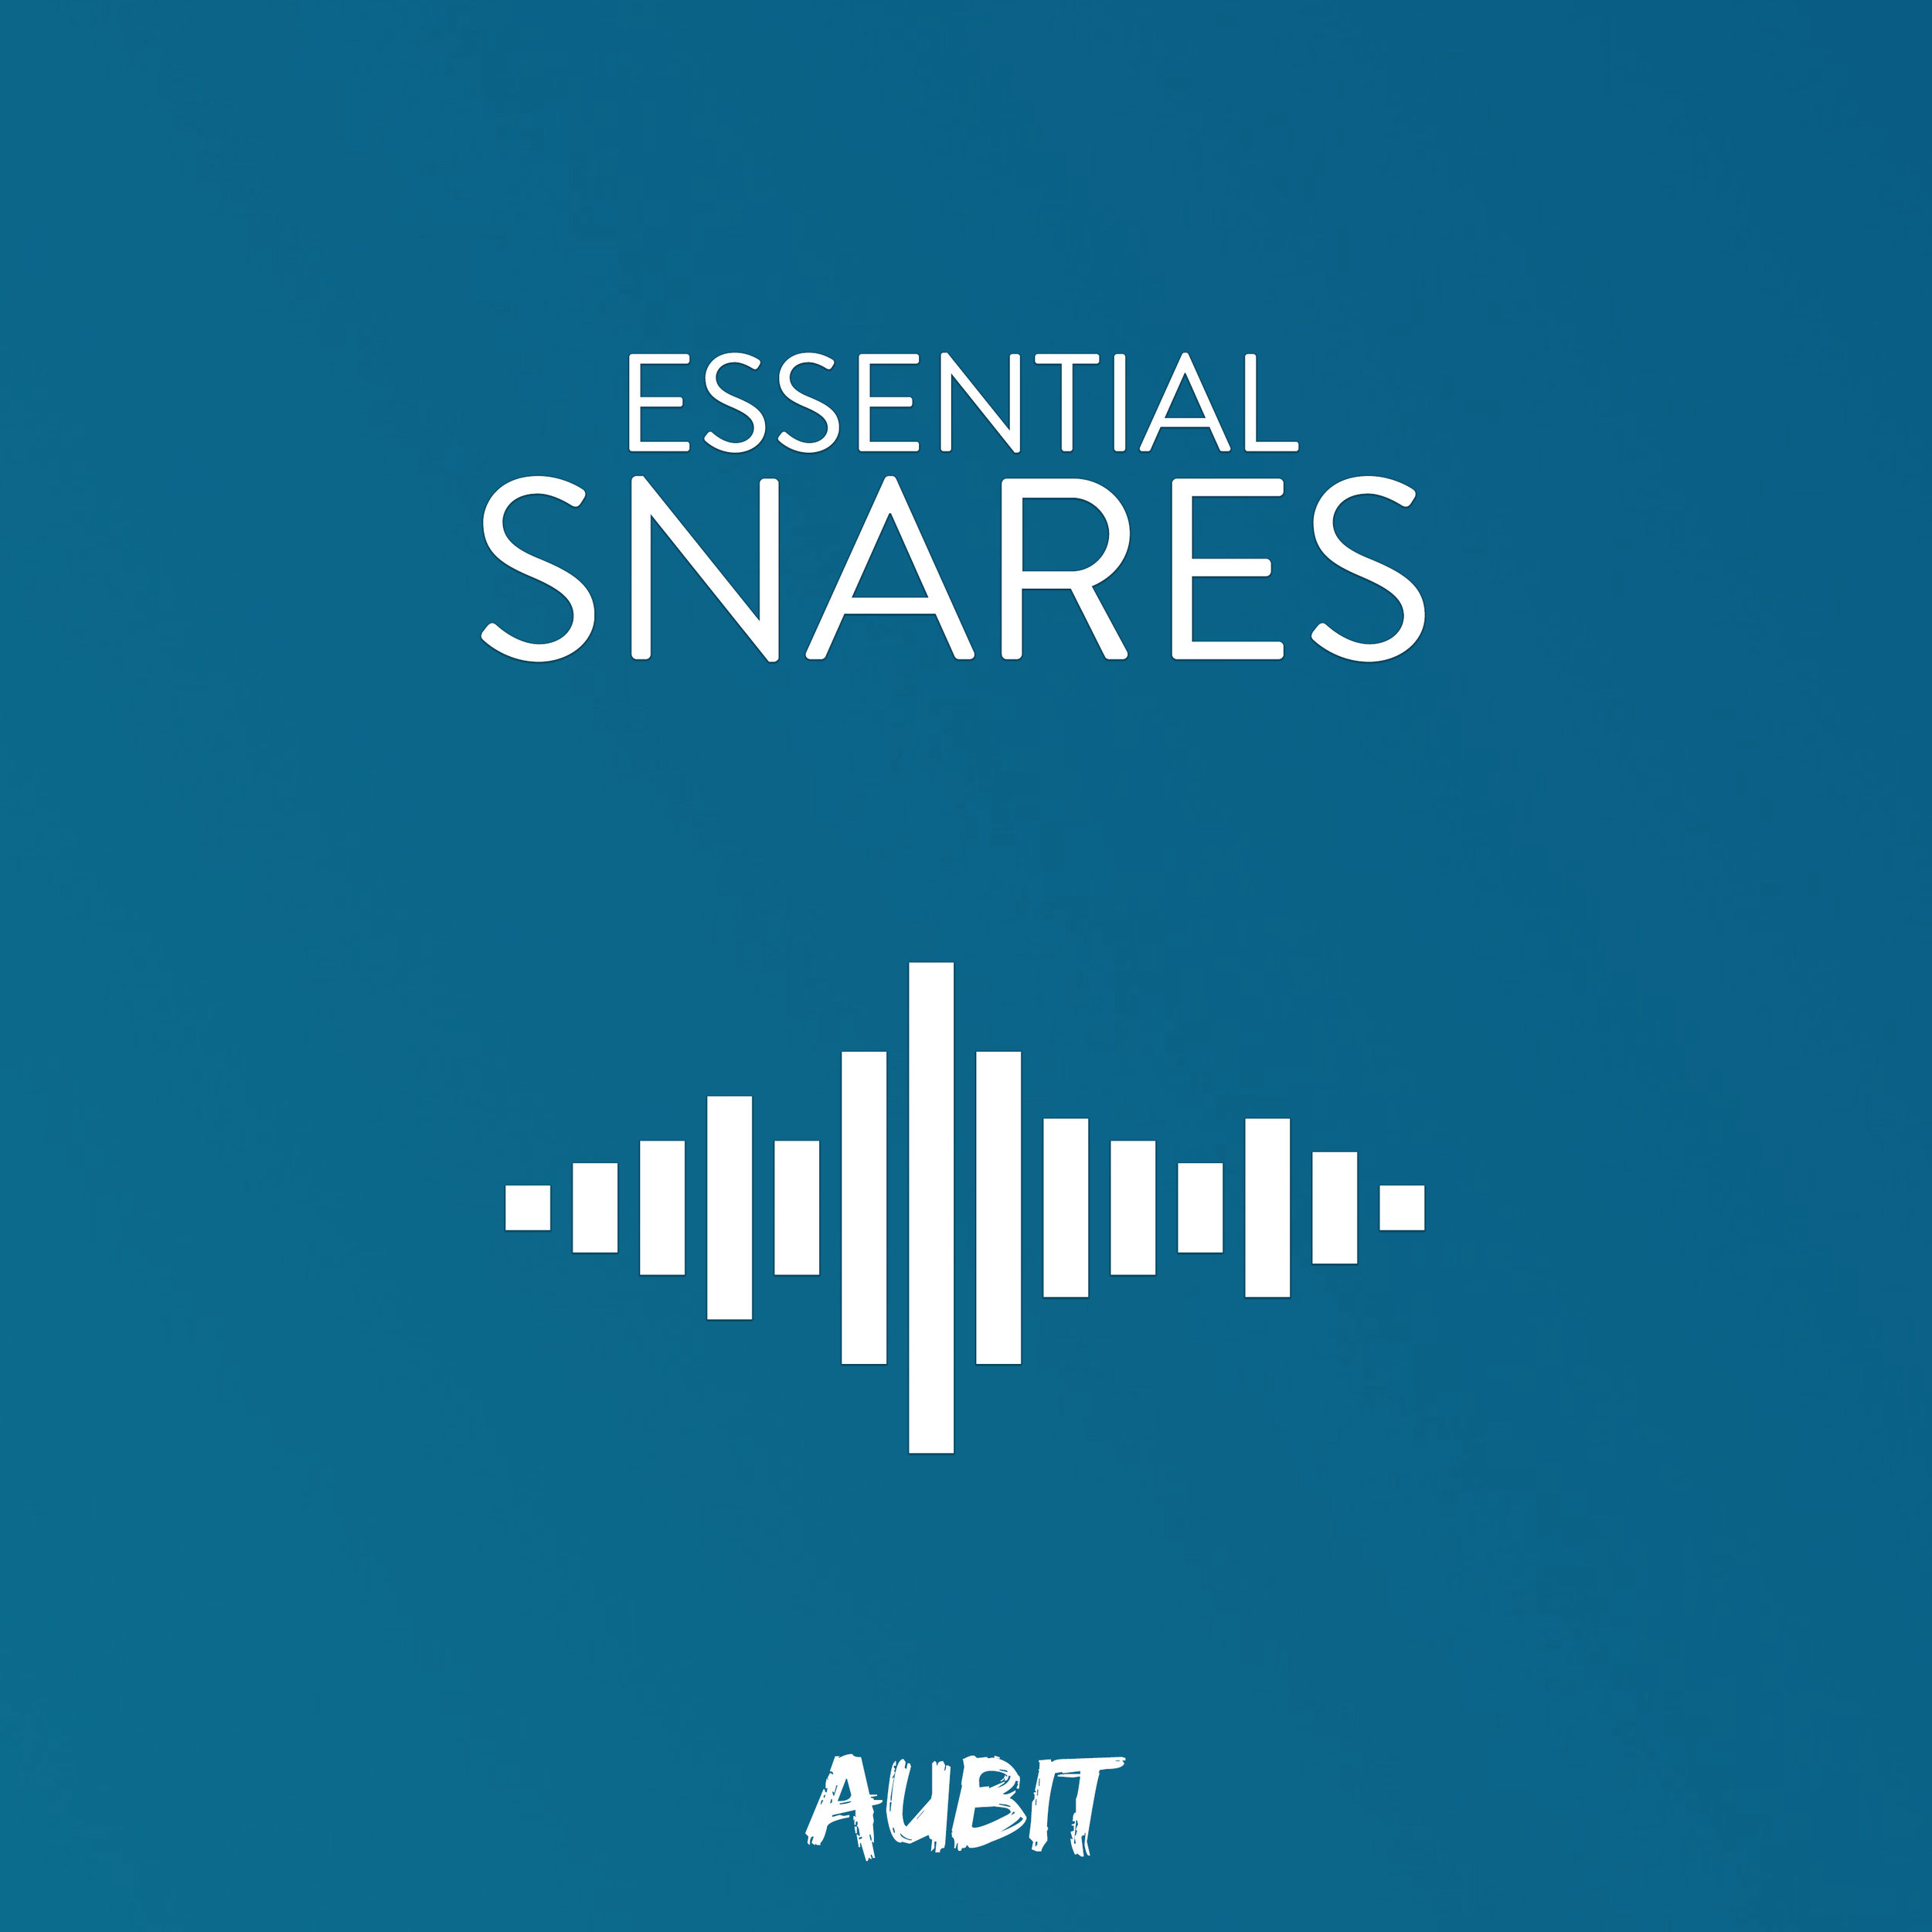 Aubit - Essential Snares.jpg